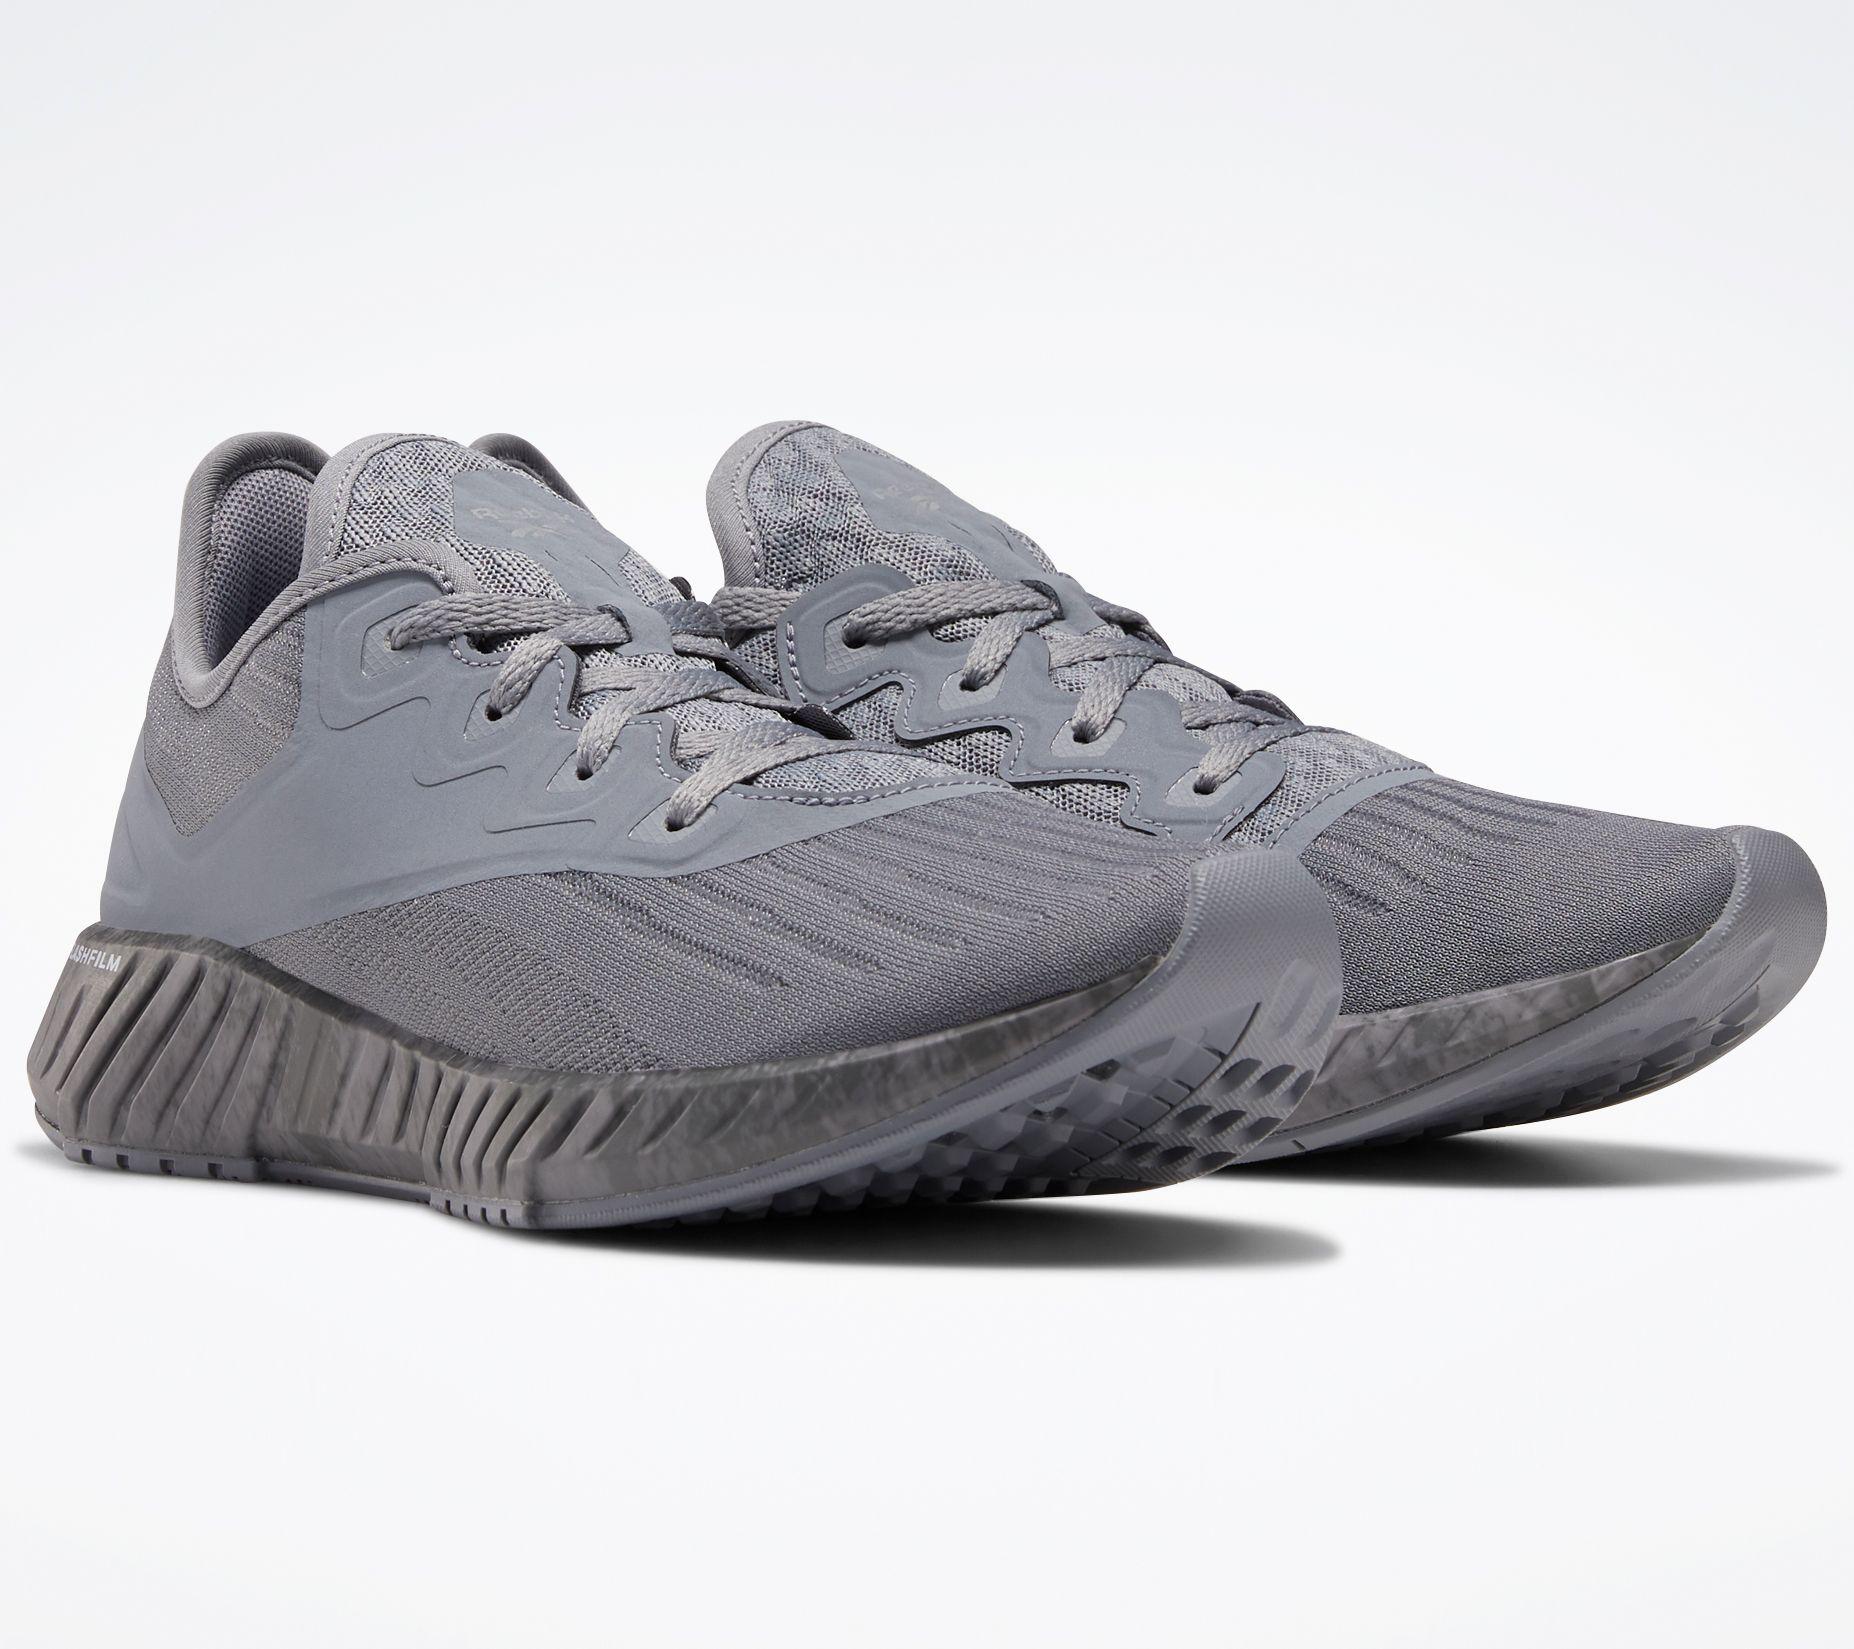 Reebok Flashfilm 2 Men/'s Running Shoes